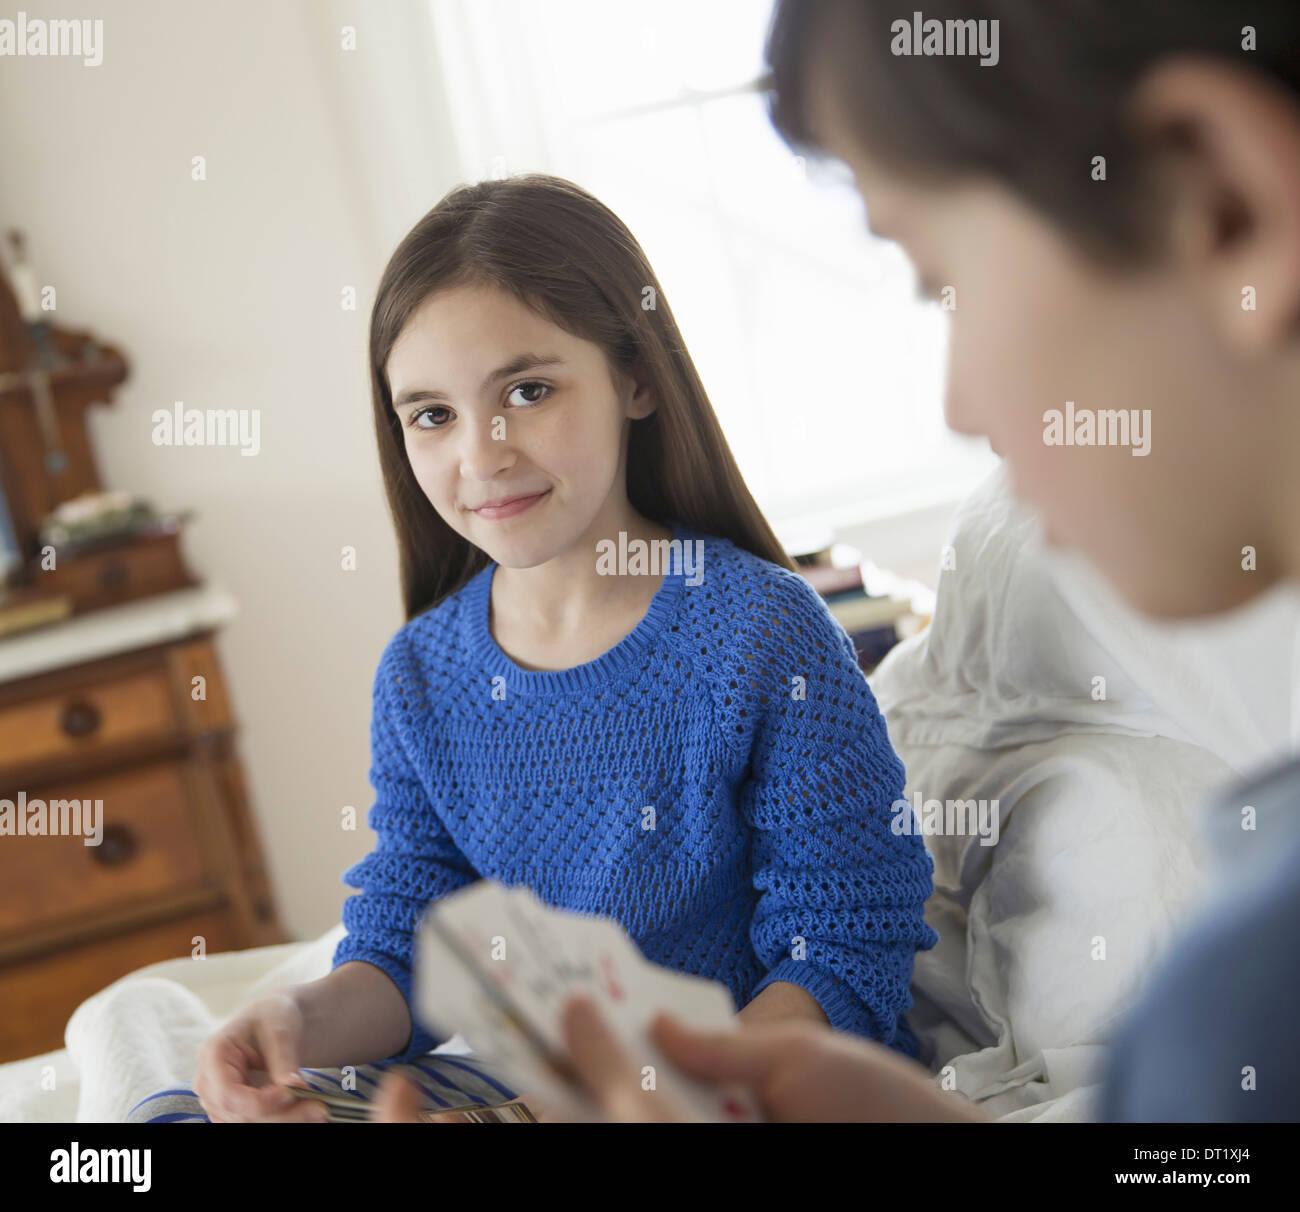 home game stockfotos home game bilder alamy. Black Bedroom Furniture Sets. Home Design Ideas